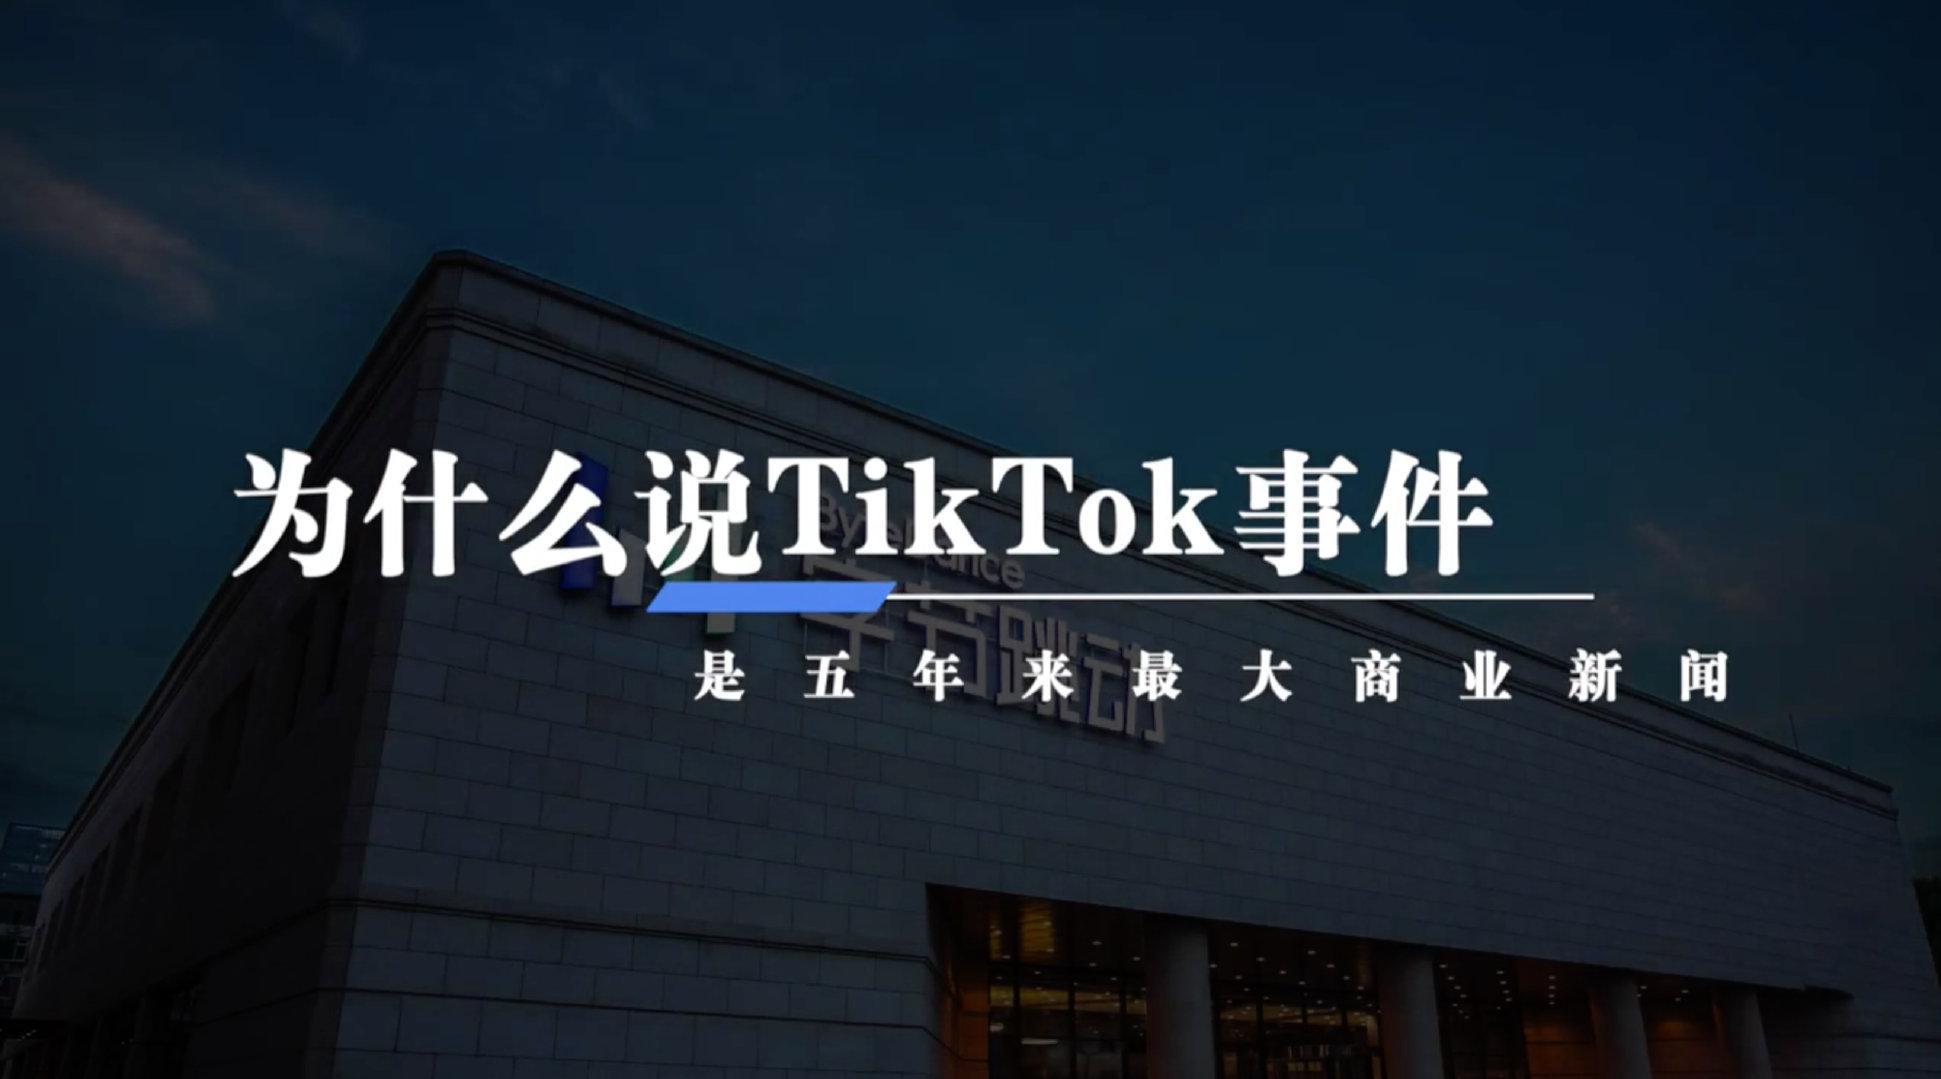 WHY|为什么说TikTok事件是五年来最大商业新闻?